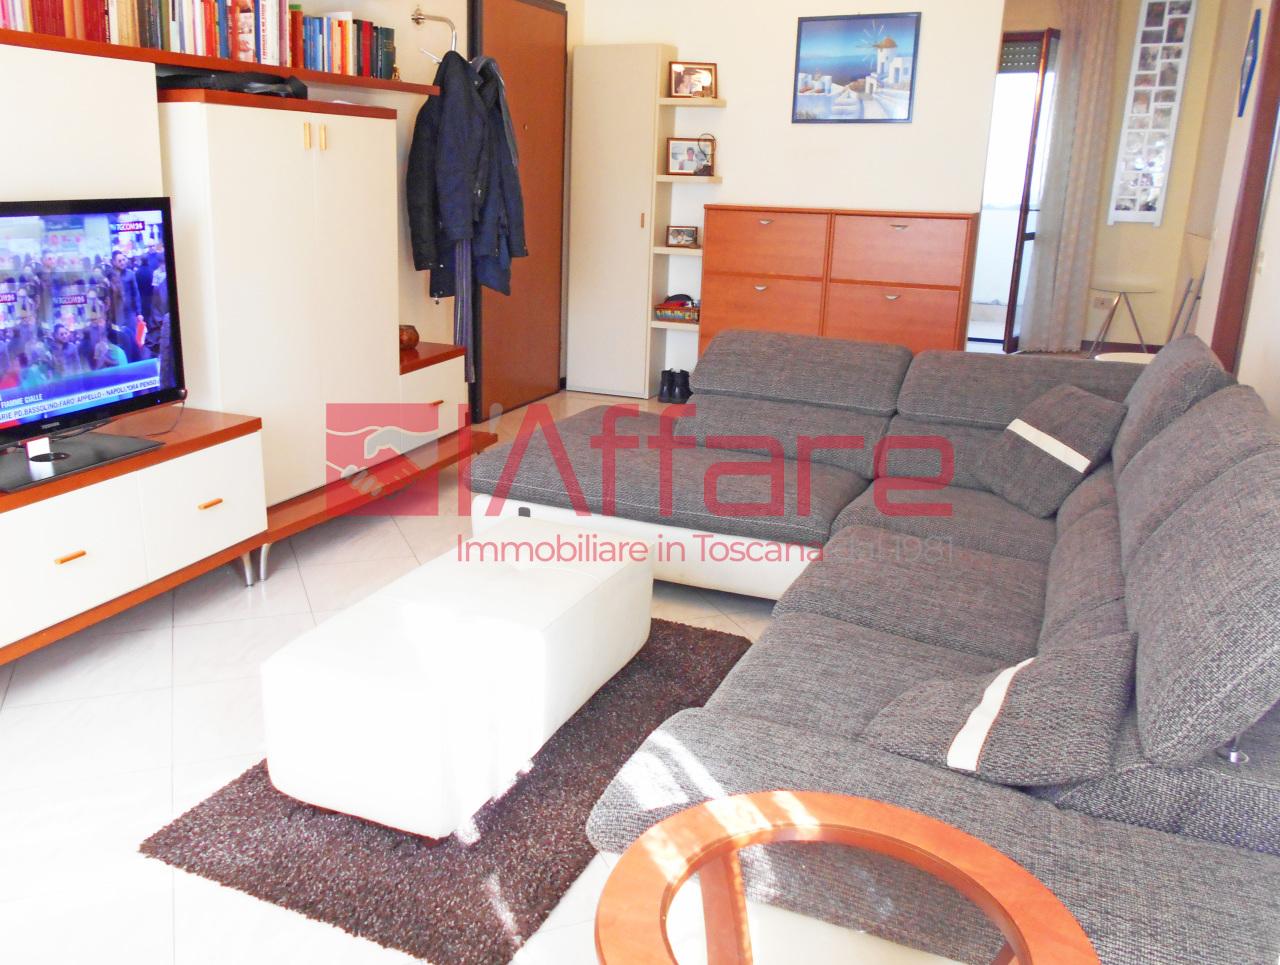 Appartamento in vendita - Pieve a Nievole